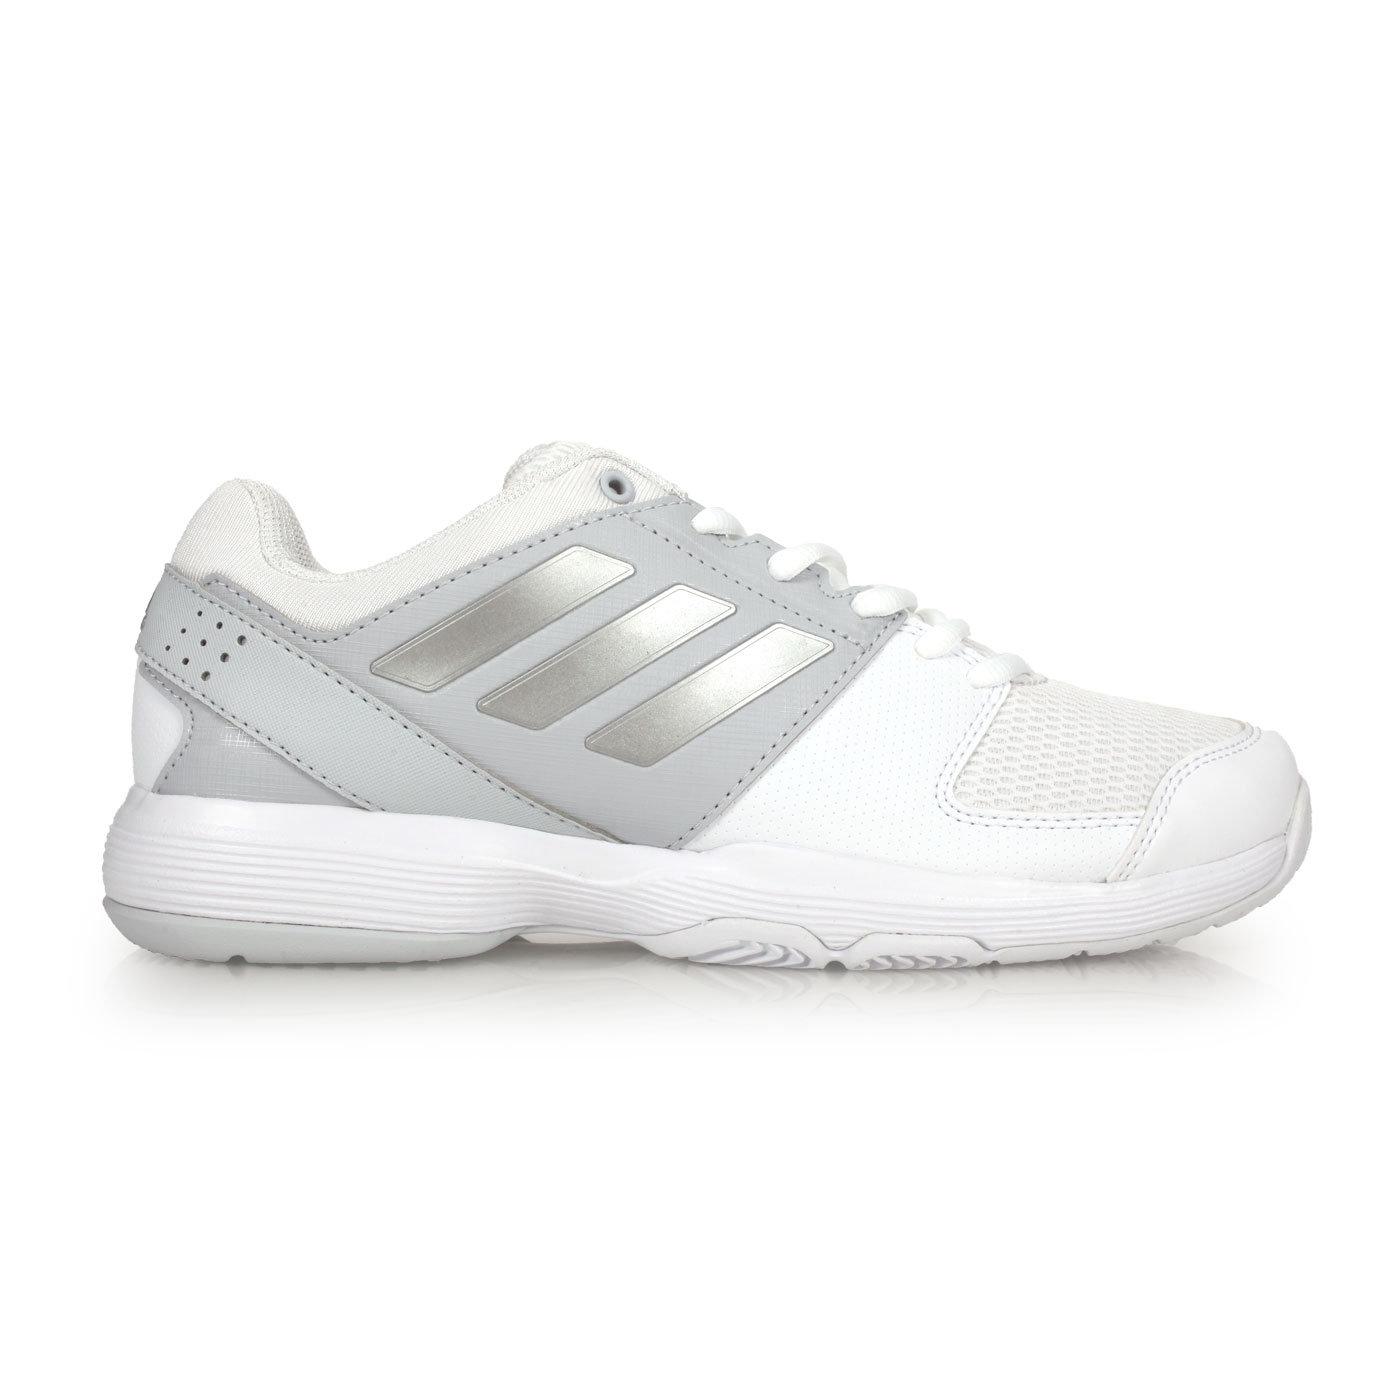 ADIDAS barricade court w 女網球鞋 (免運 愛迪達【02016464】≡排汗專家≡